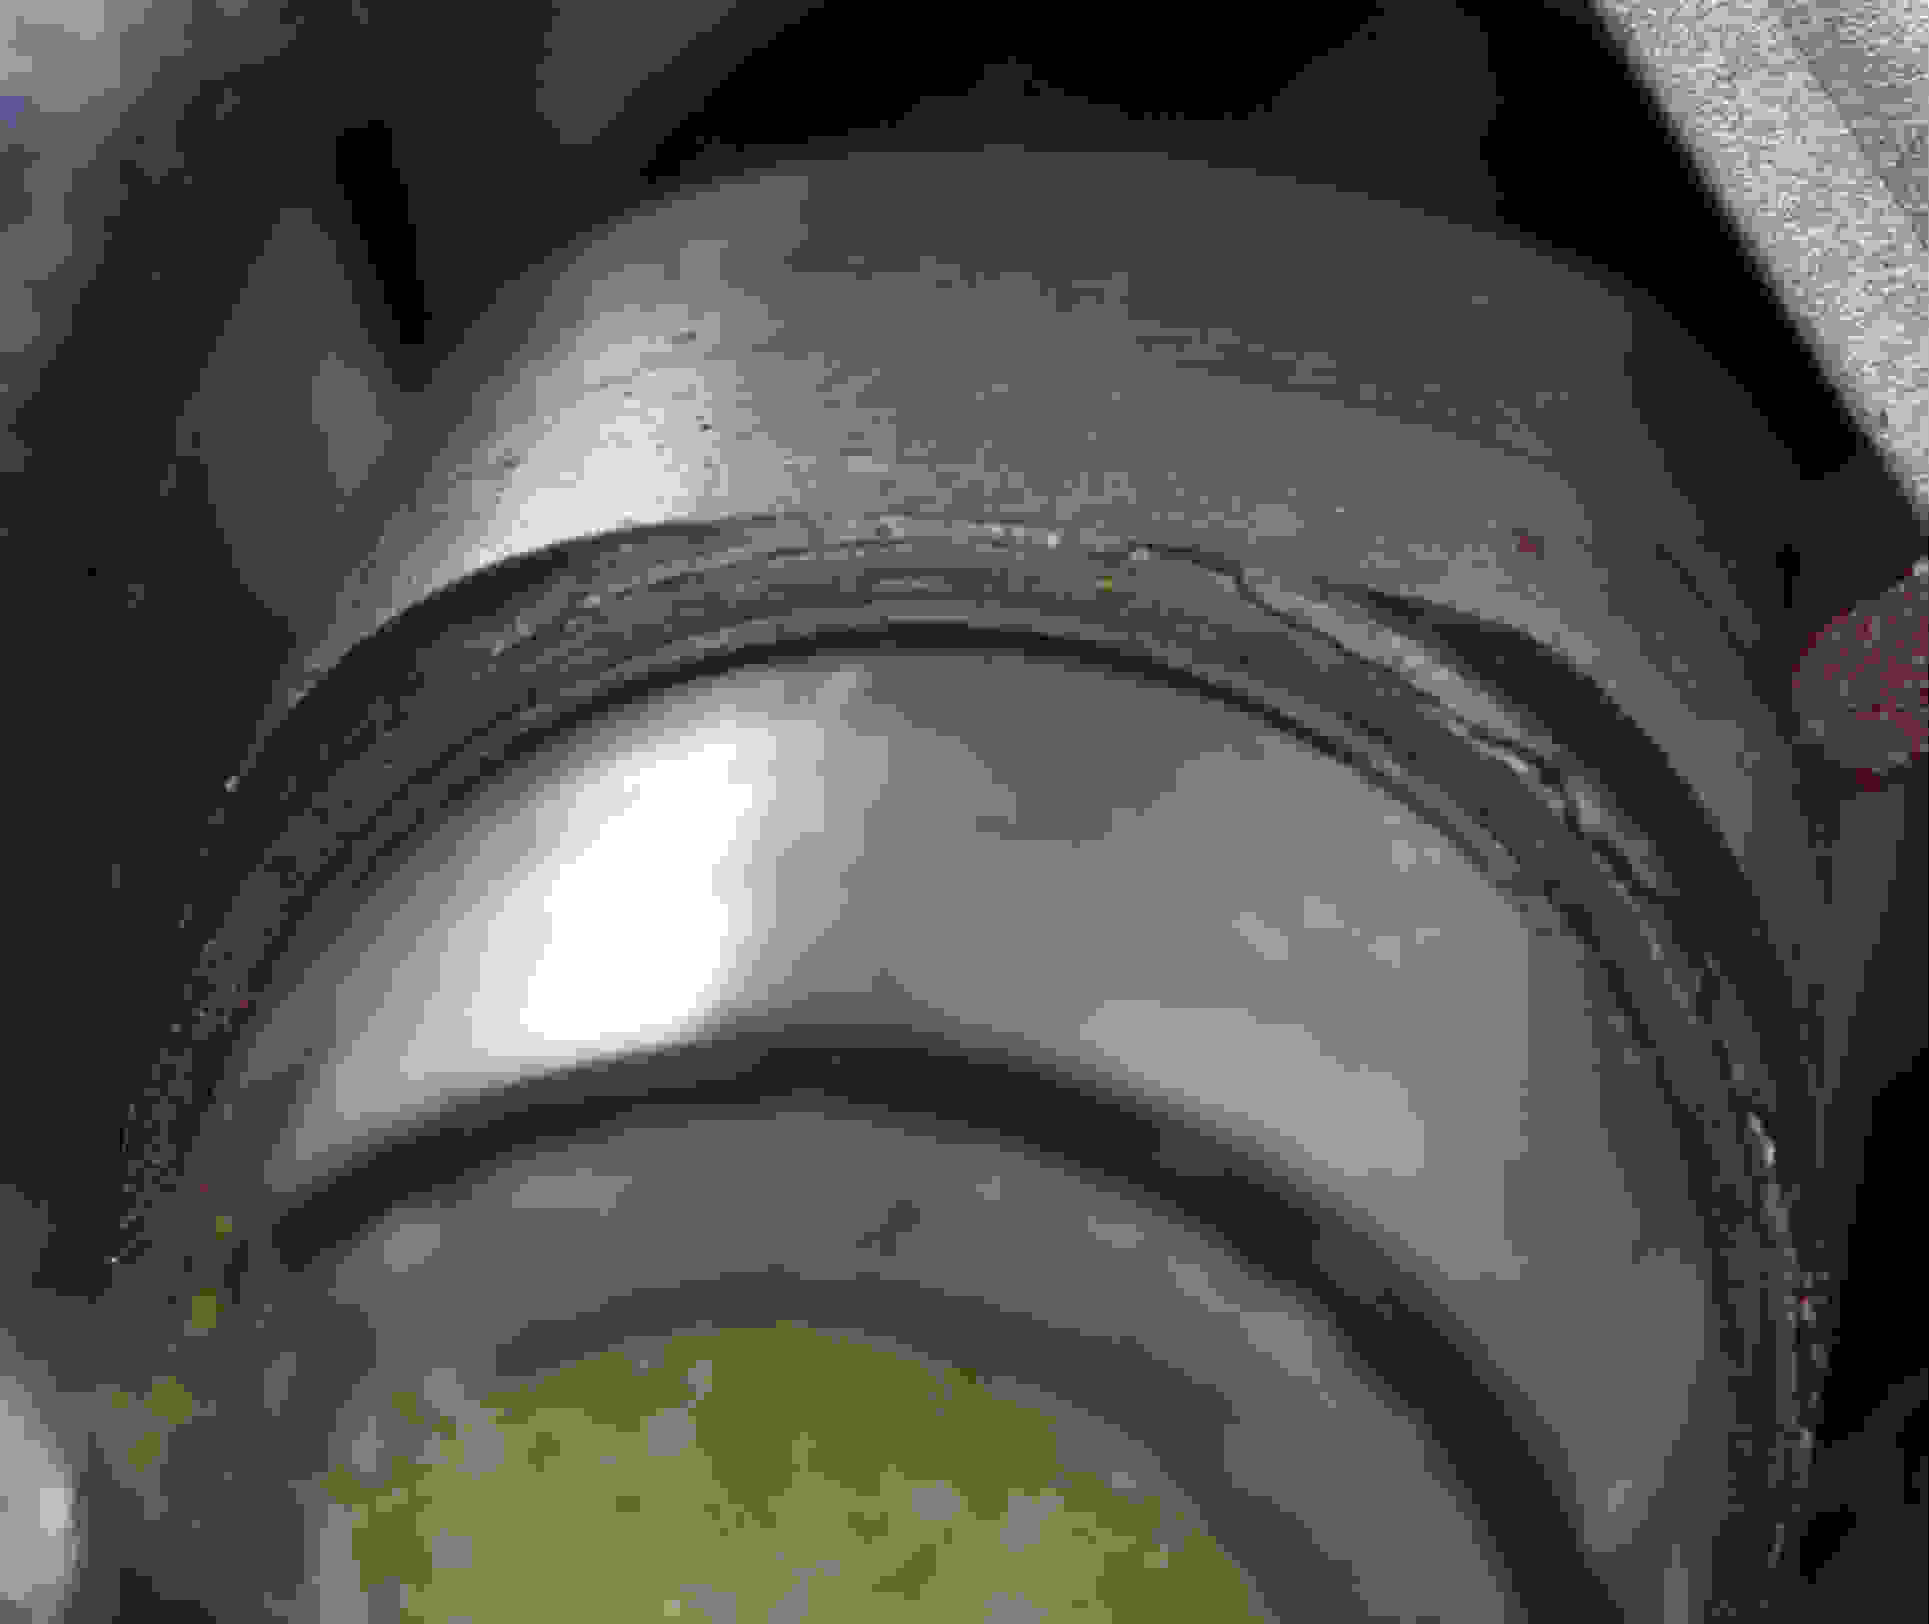 asymmetrical cam lobe pic